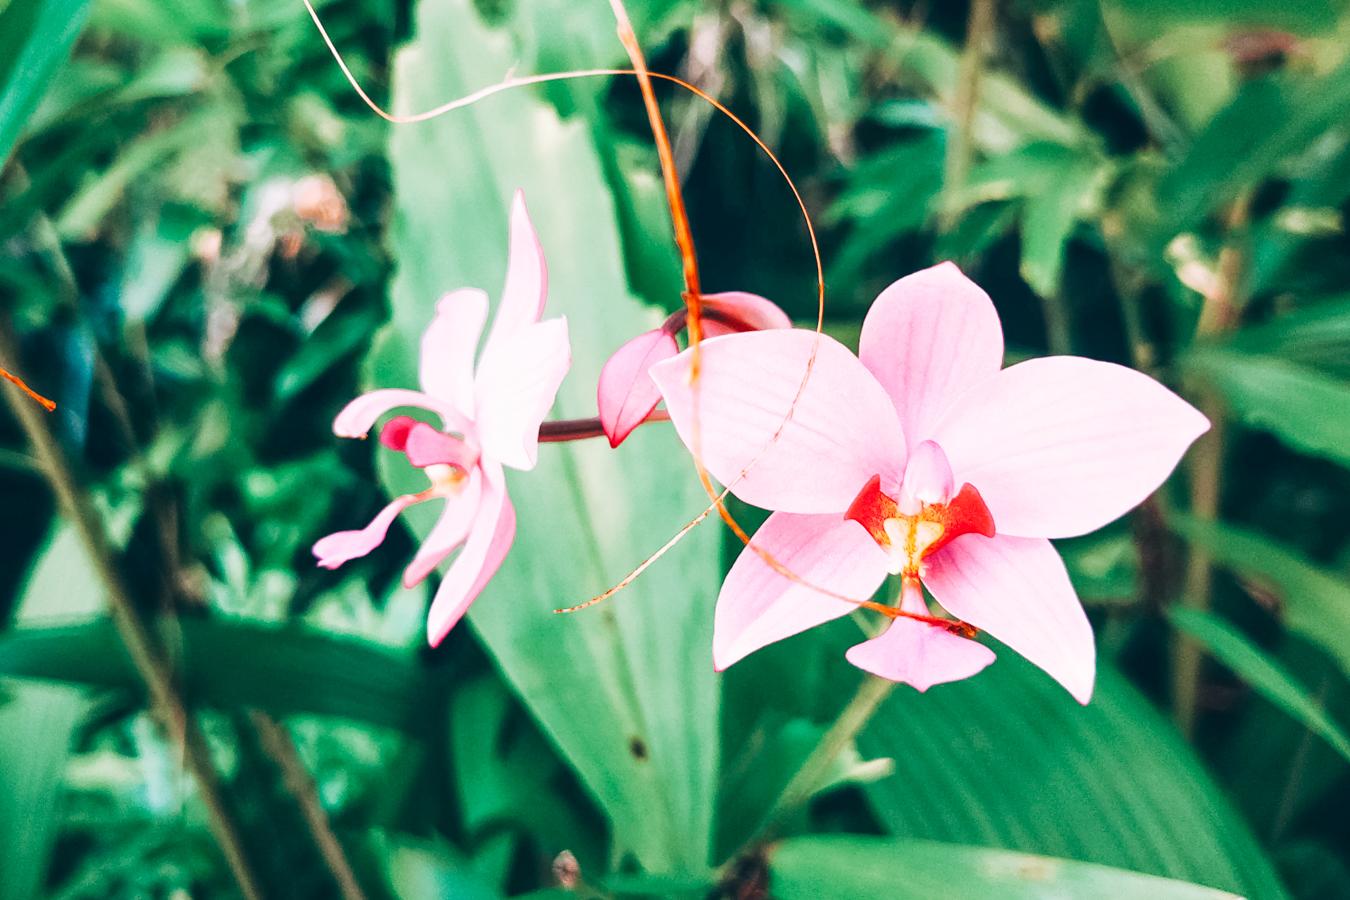 Flowers at the Fairchild Tropical Botanic Garden